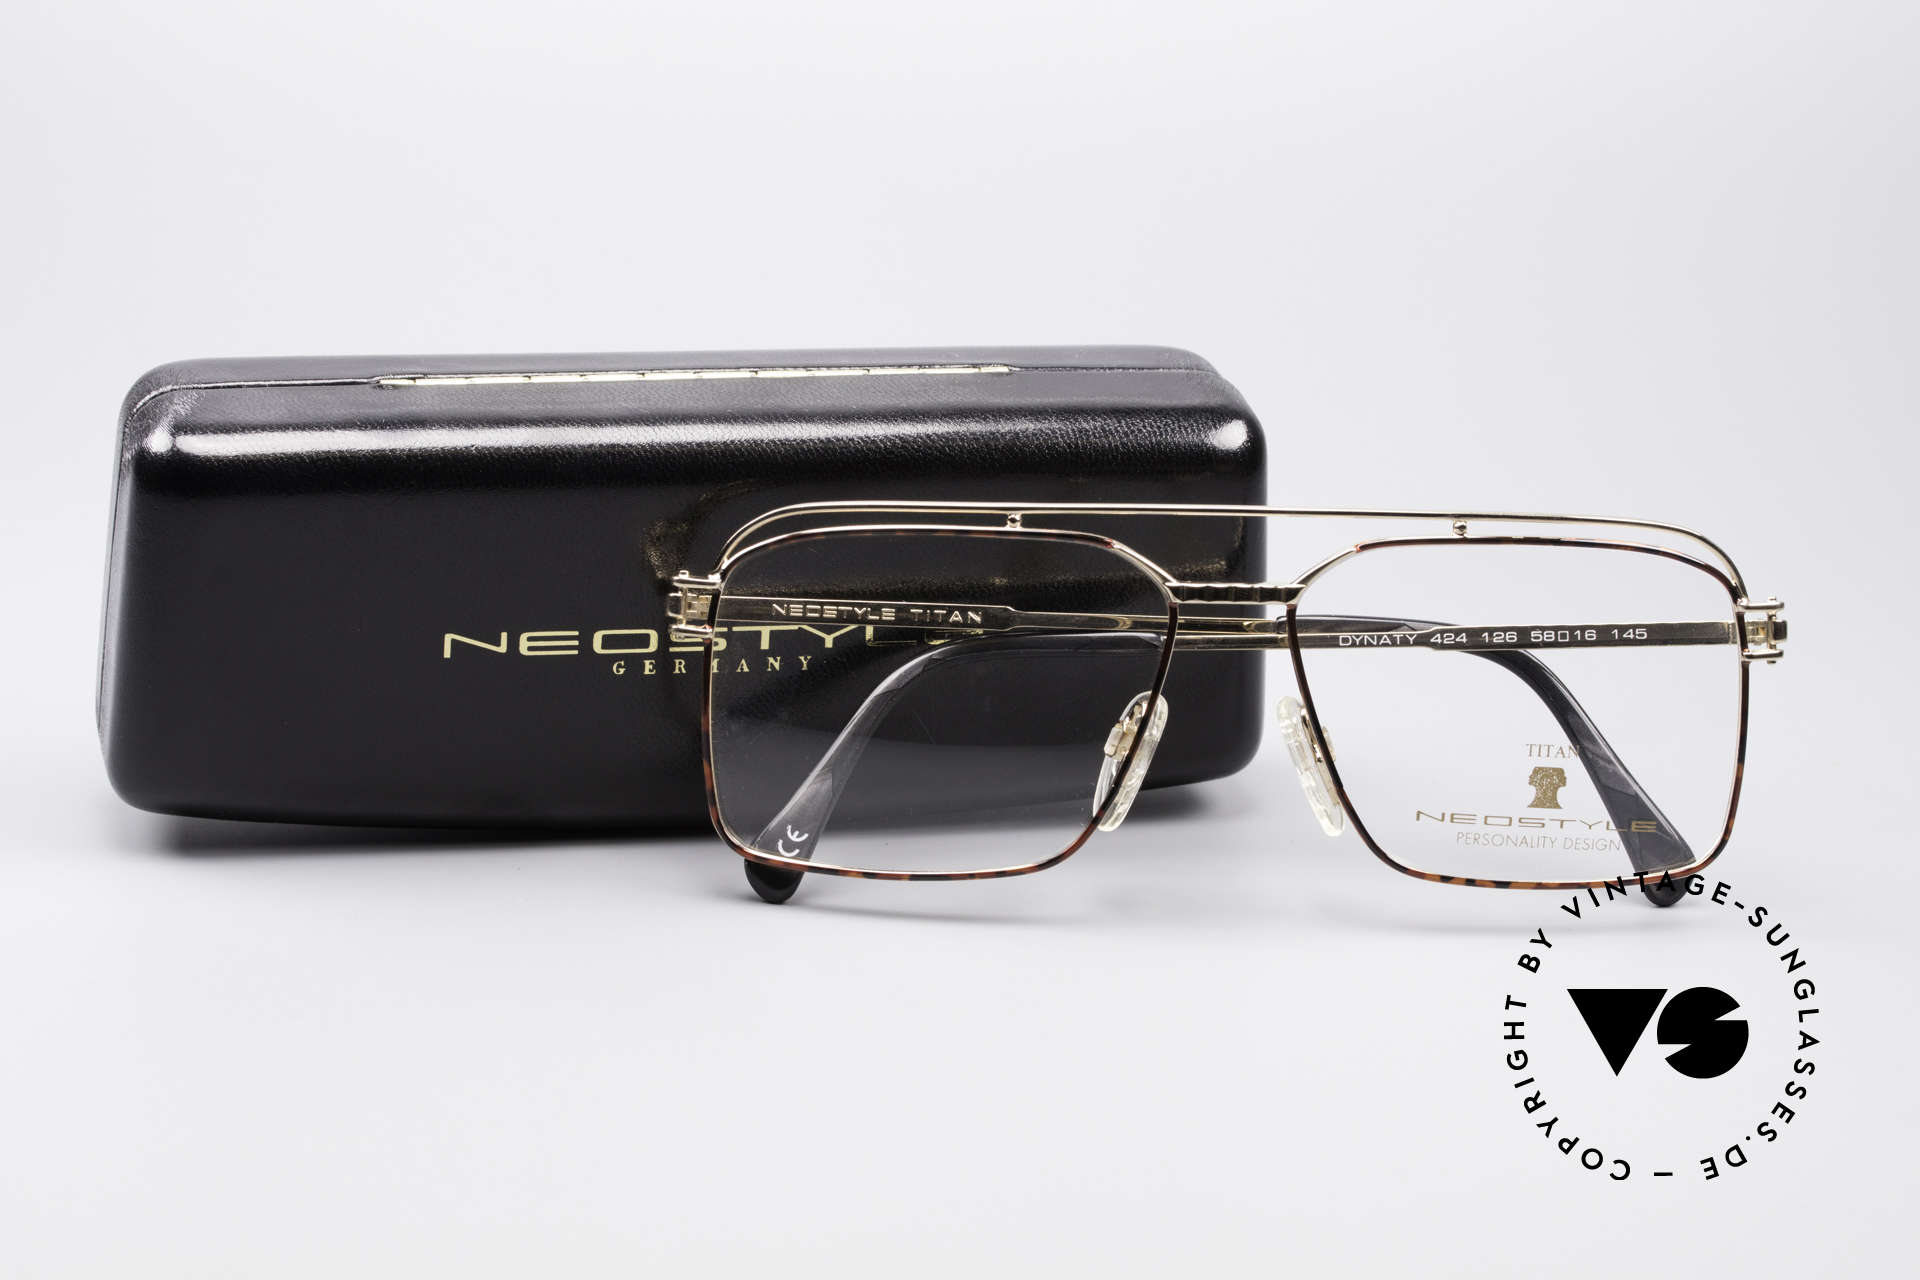 Neostyle Dynasty 424 - L 80's Titanium Men's Frame, the frame fits lenses of any kind (optical / sun), Made for Men